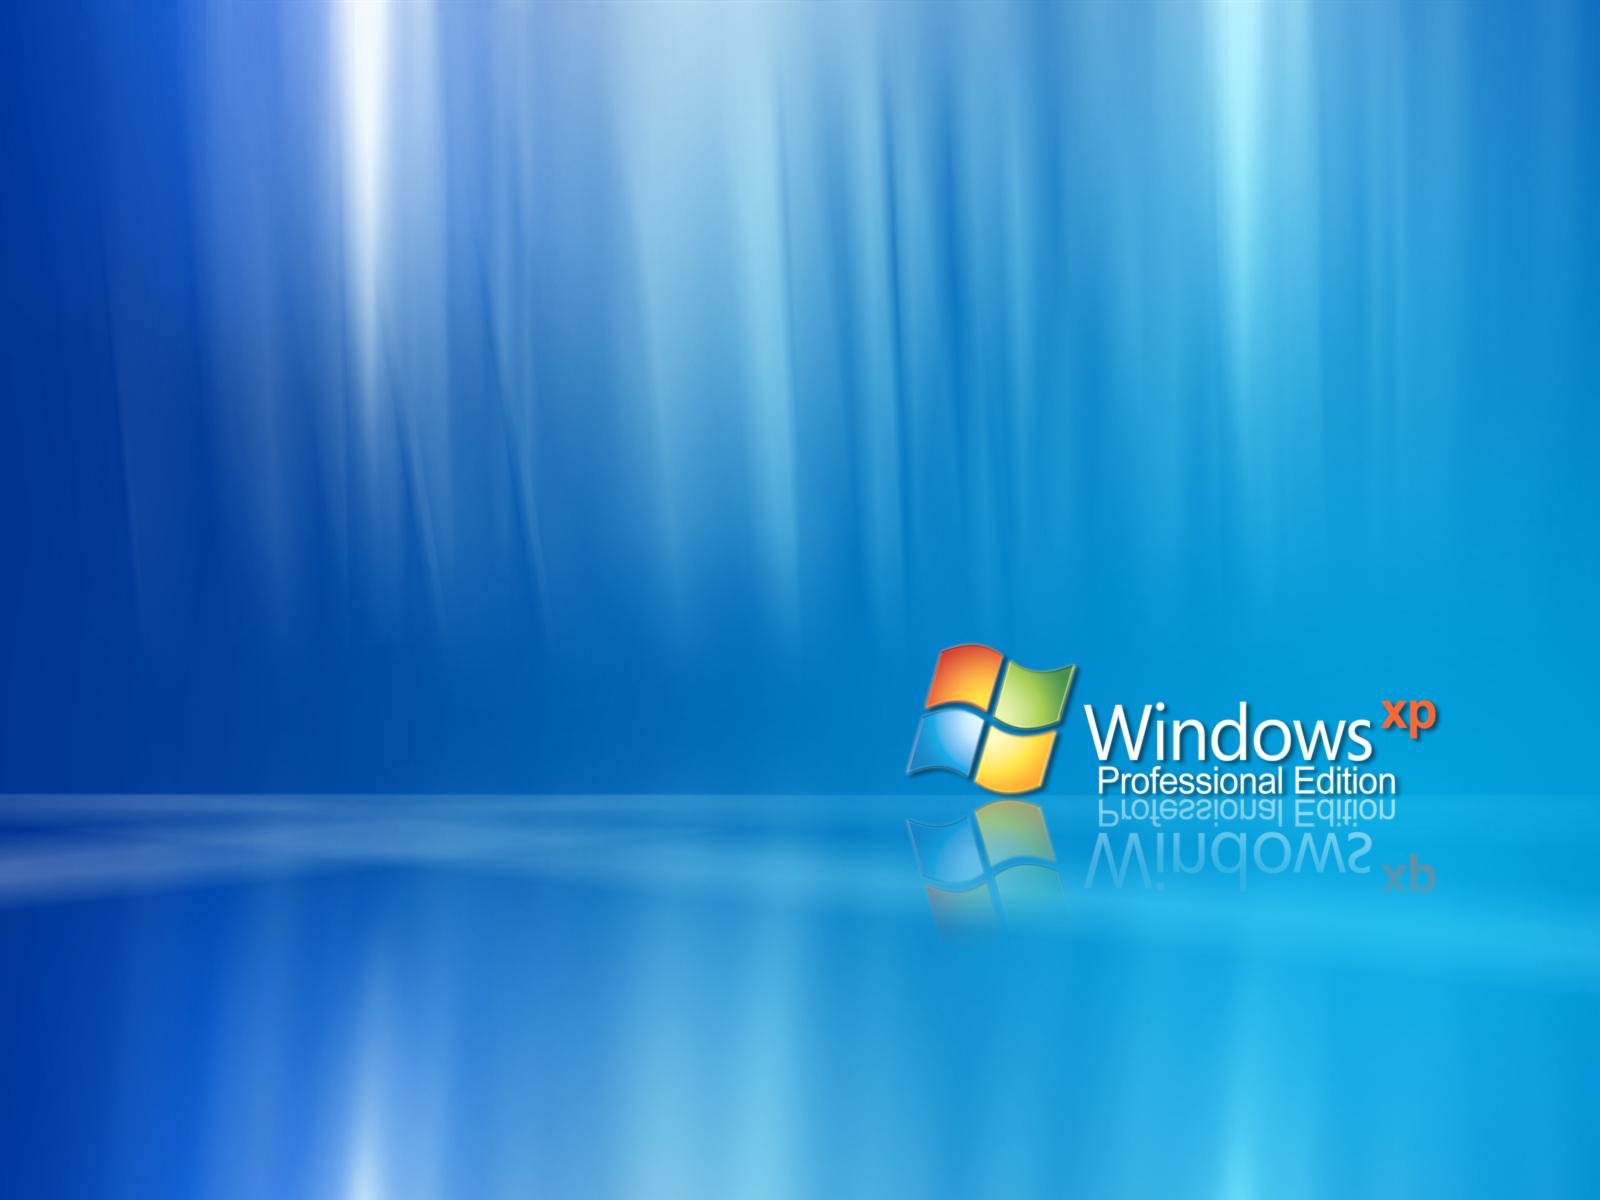 Live Wallpaper Windows Xp Sf